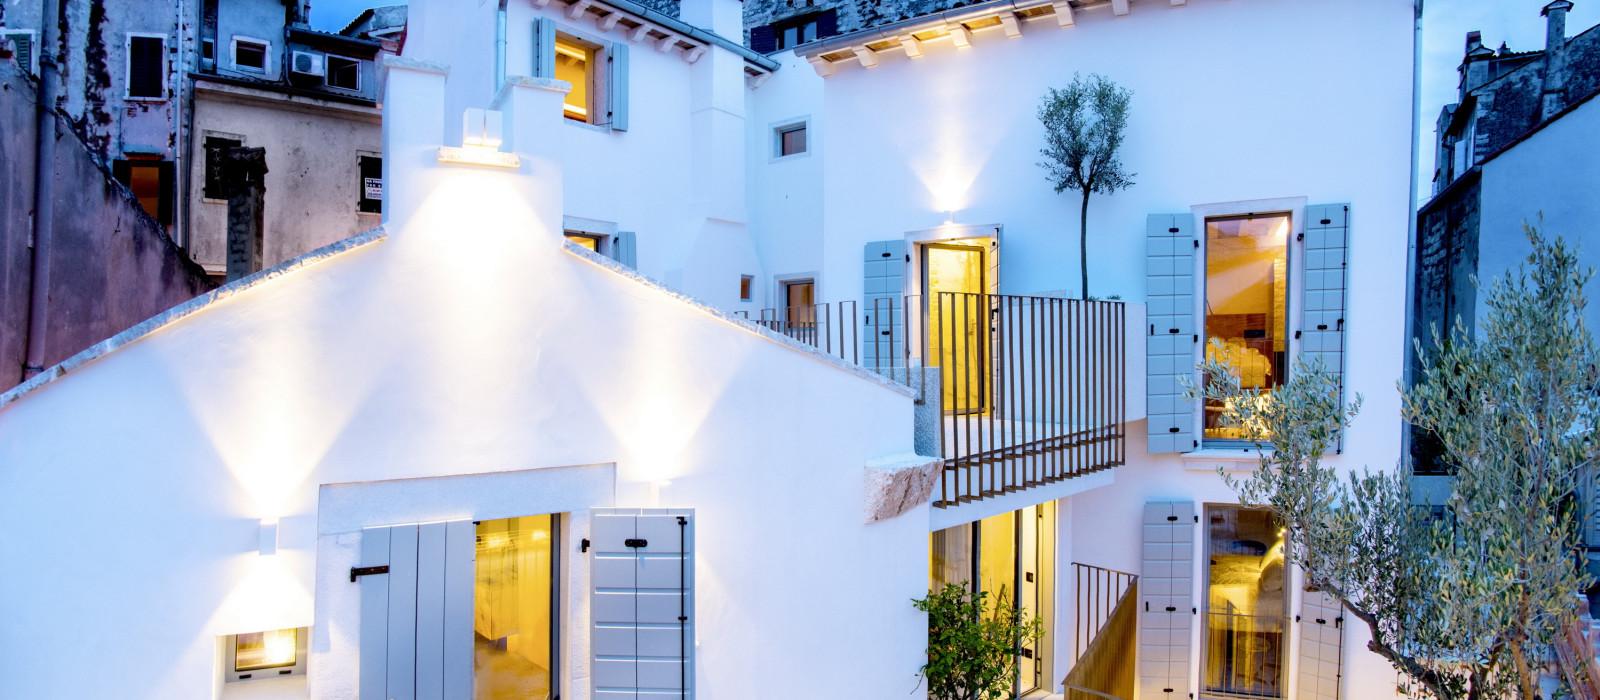 Hotel Spirito Santo Palazzo Storico Kroatien & Slowenien